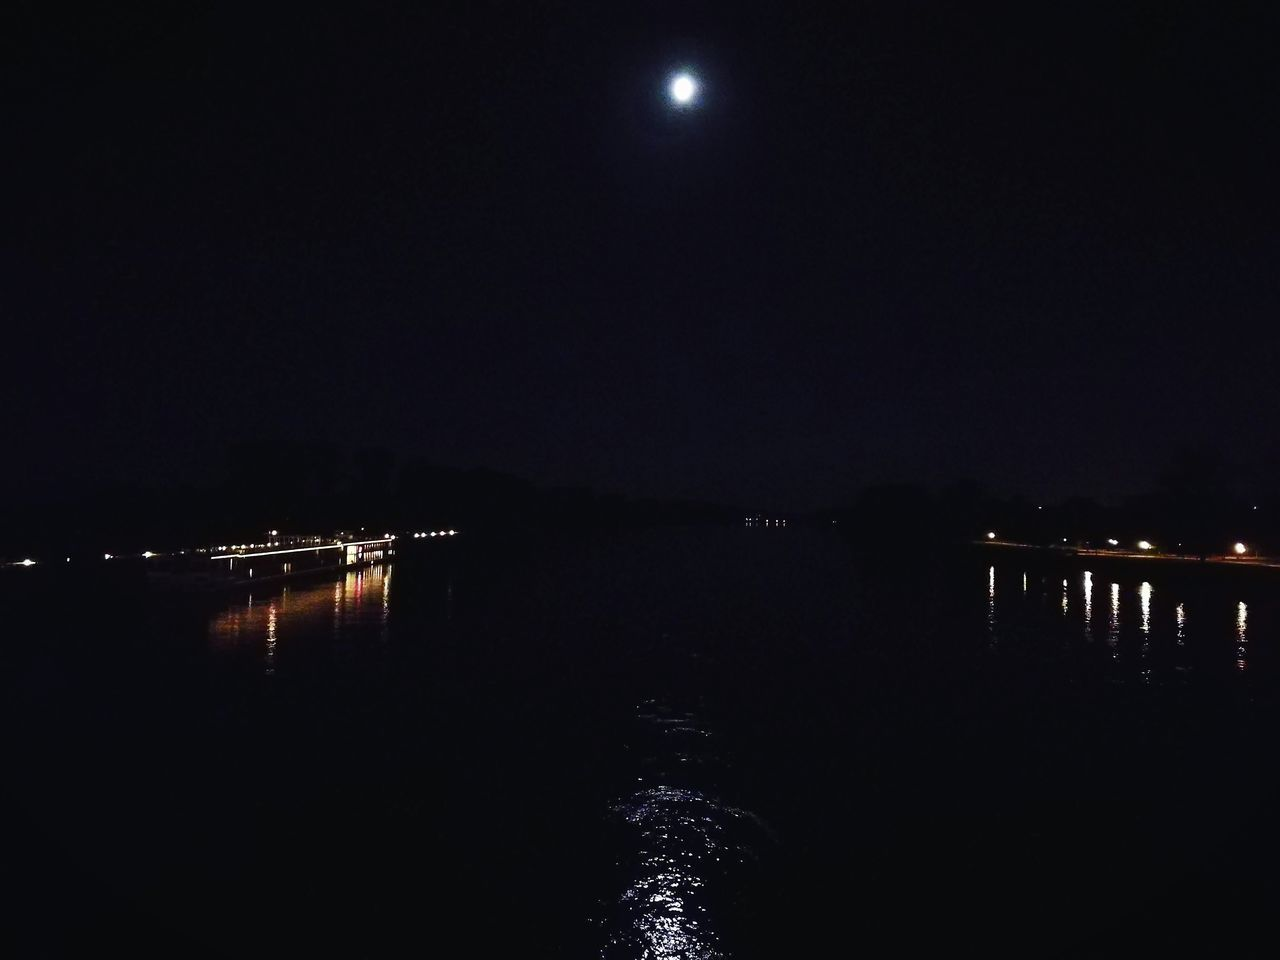 Moonlight Moon Moonshine Moon In The Water Moonlightscape Lights In The Dark Lights In The River Lights In The Night Lights In The Sky Black Water